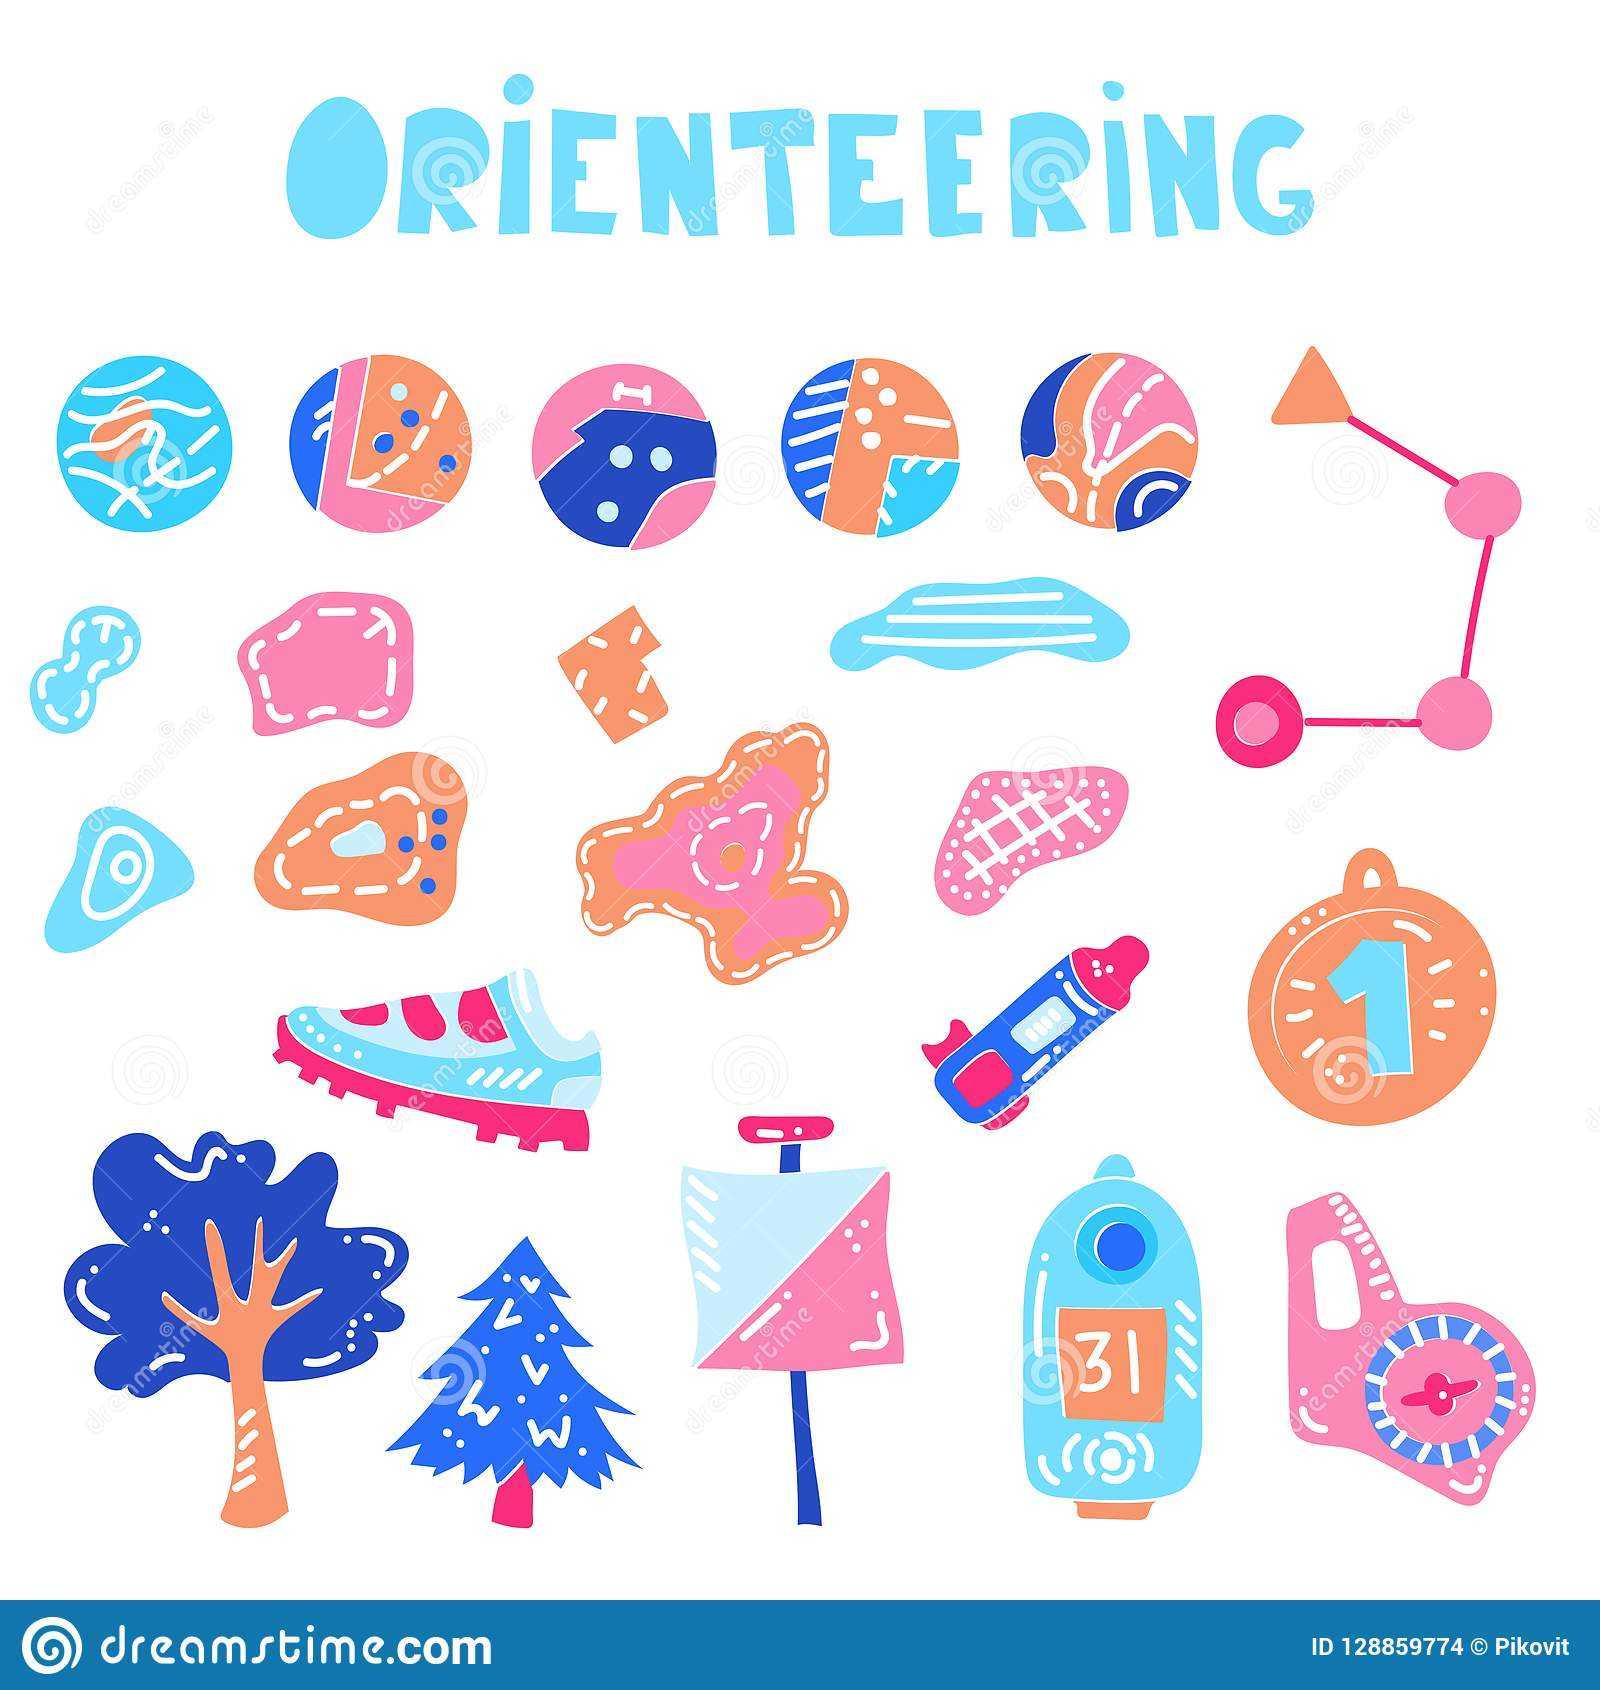 Vector Illustration Of Orienteering Map Signs Stock Vector In Orienteering Control Card Template